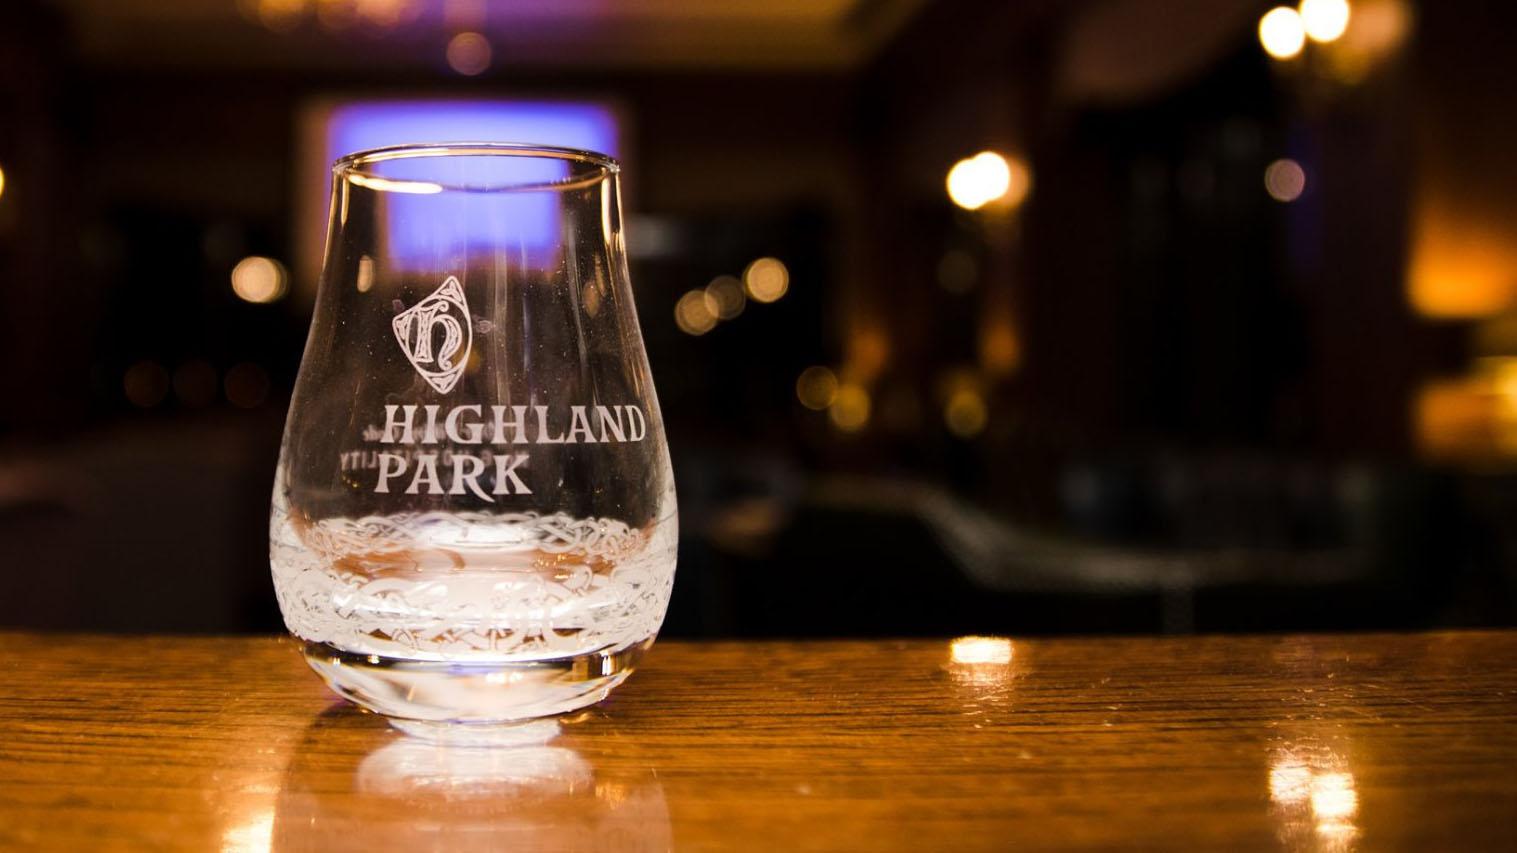 Ексклузивно представяне на Highland Park България 1190